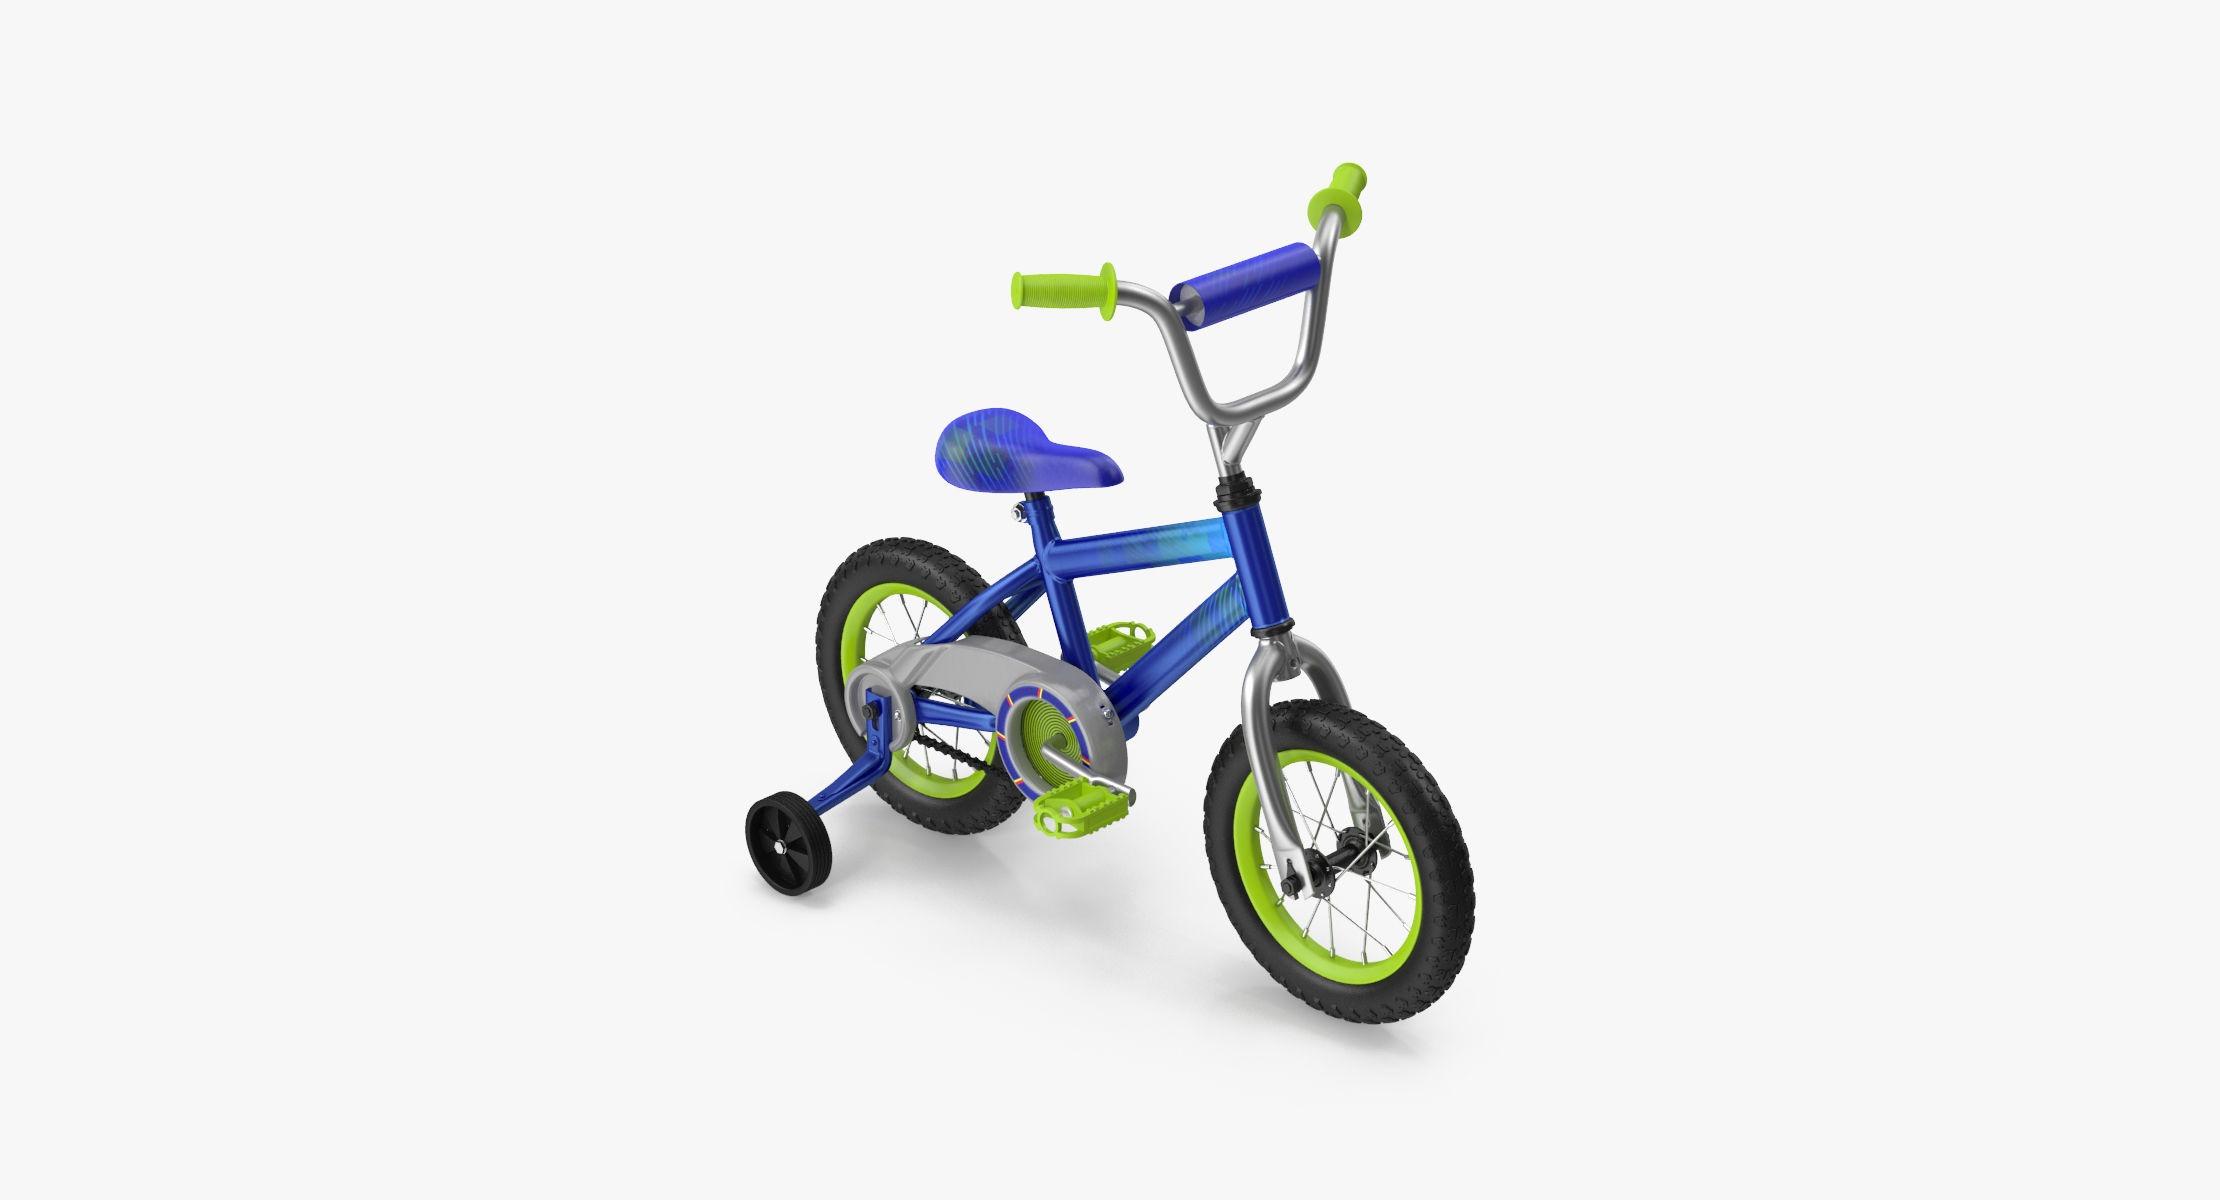 Little Boy Bicycle - reel 1